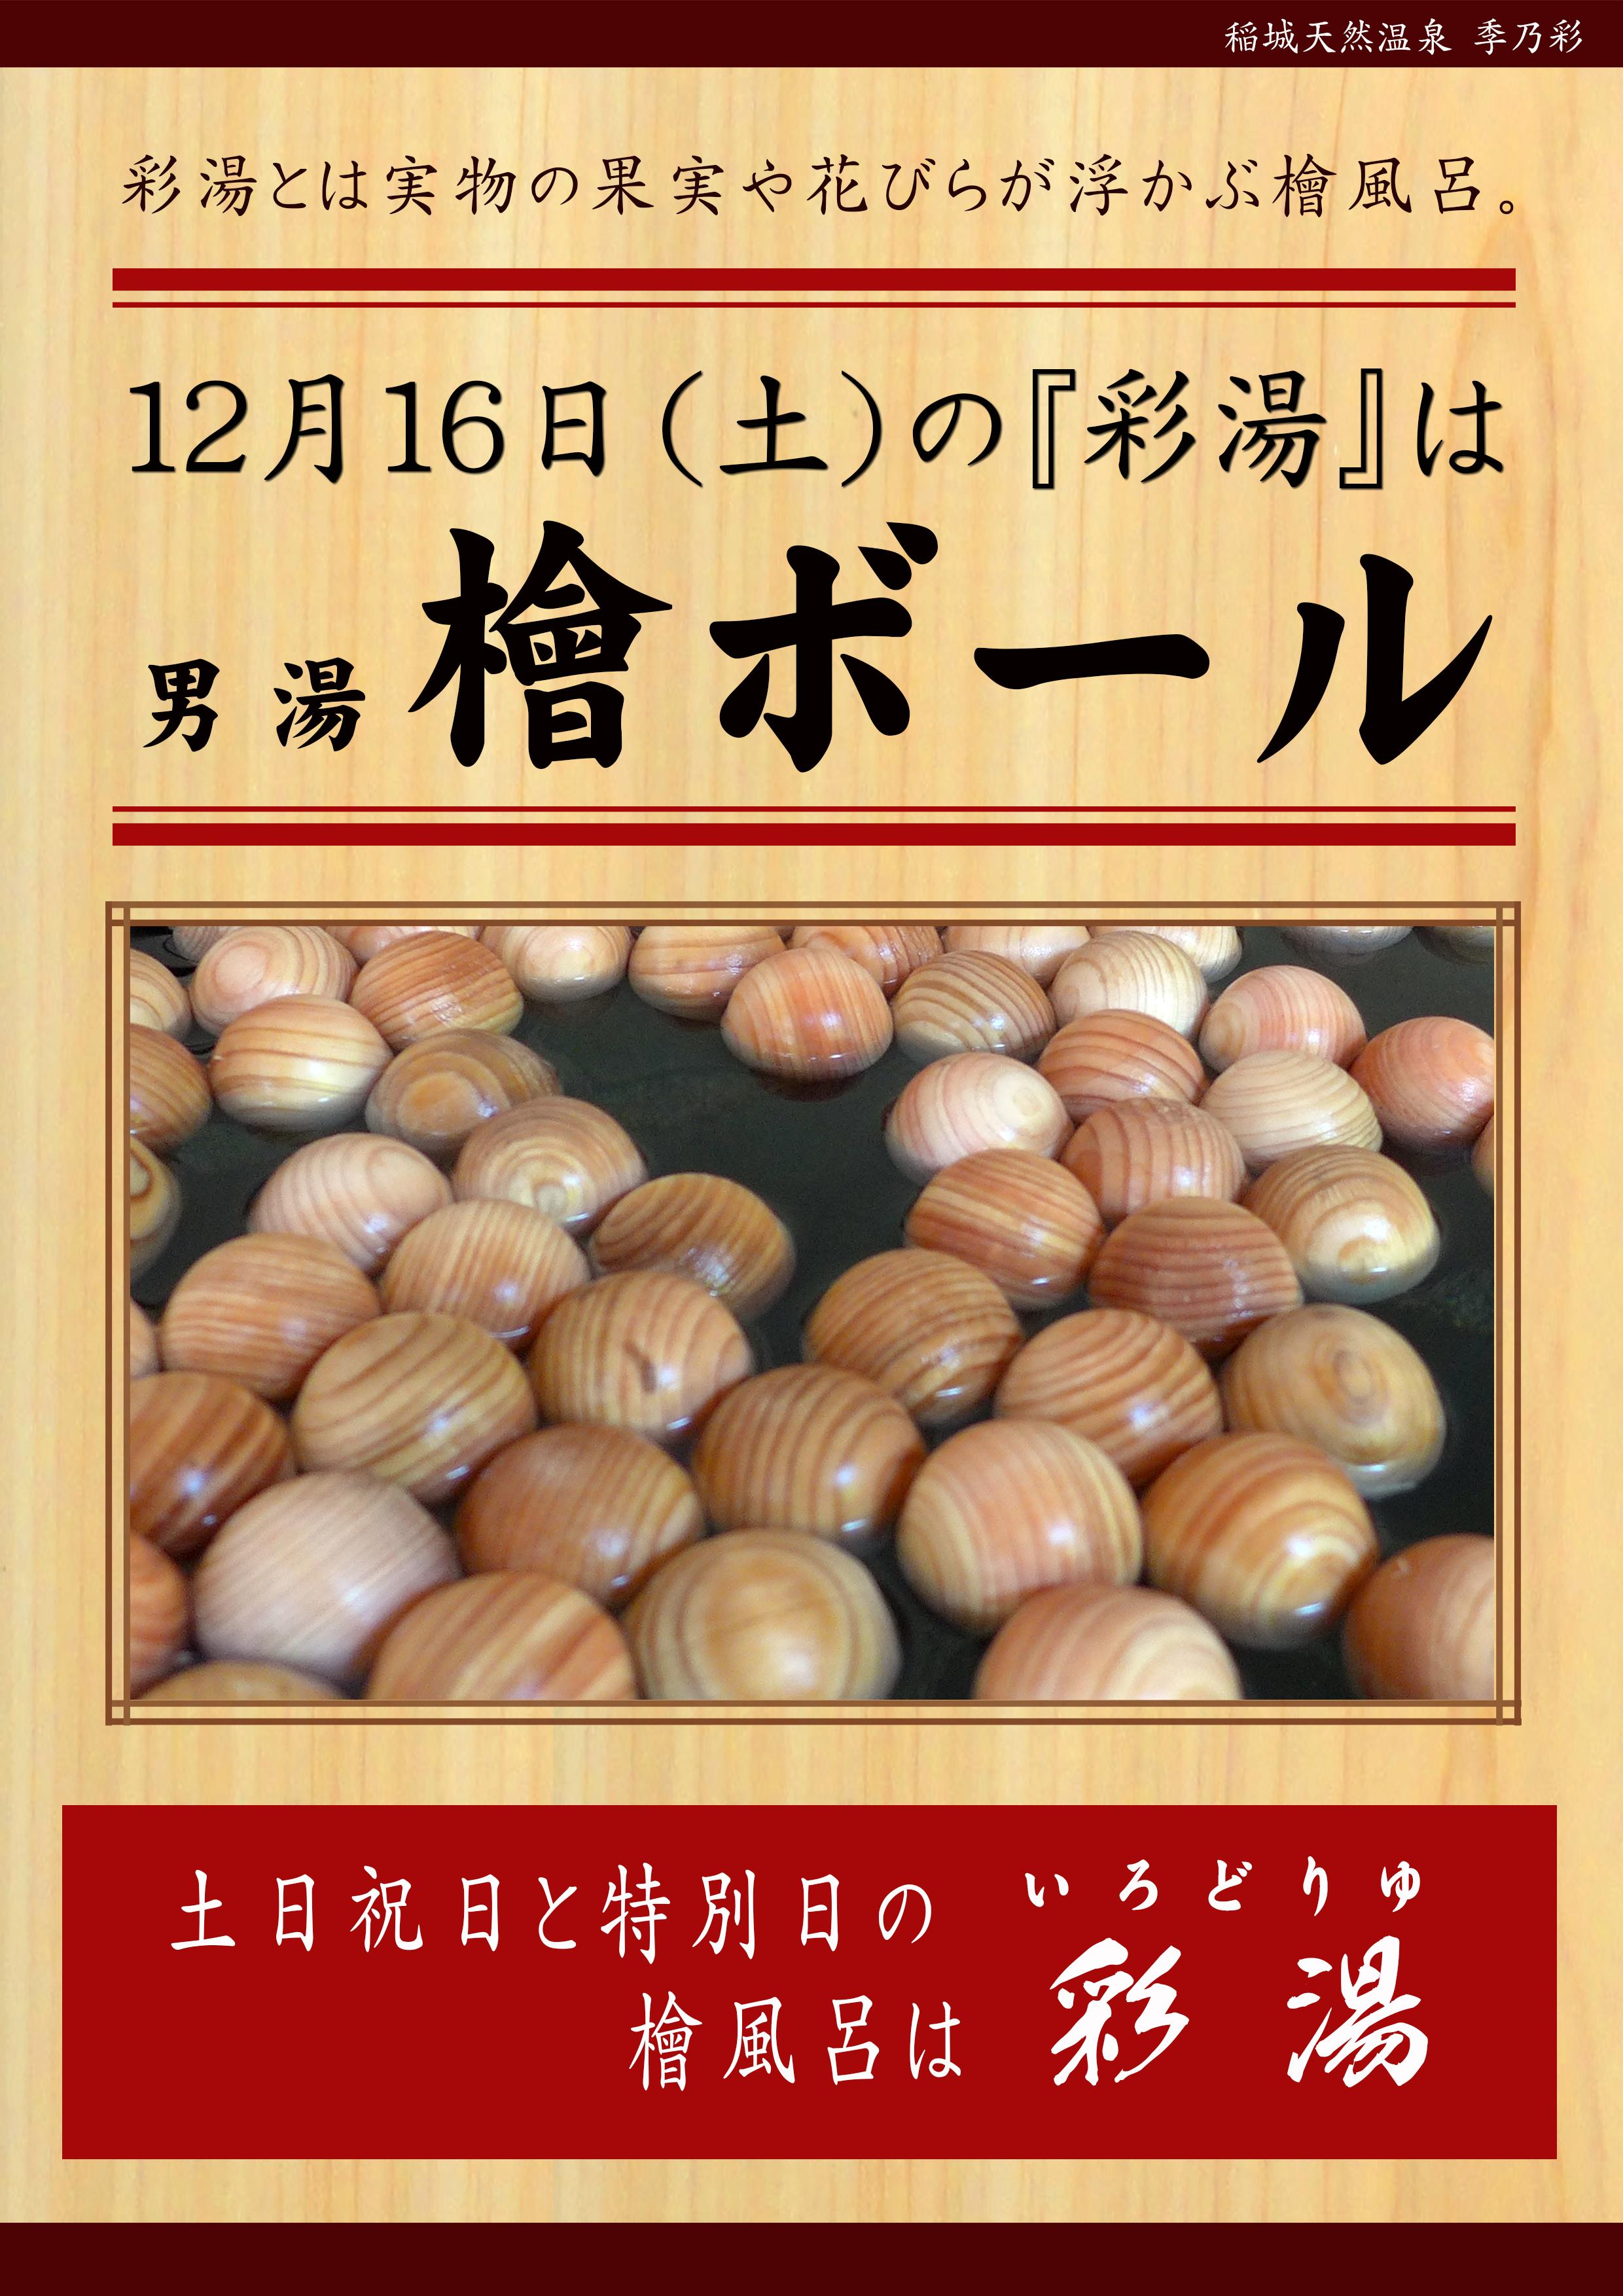 20171216POP イベント 彩湯 男湯 檜ボール